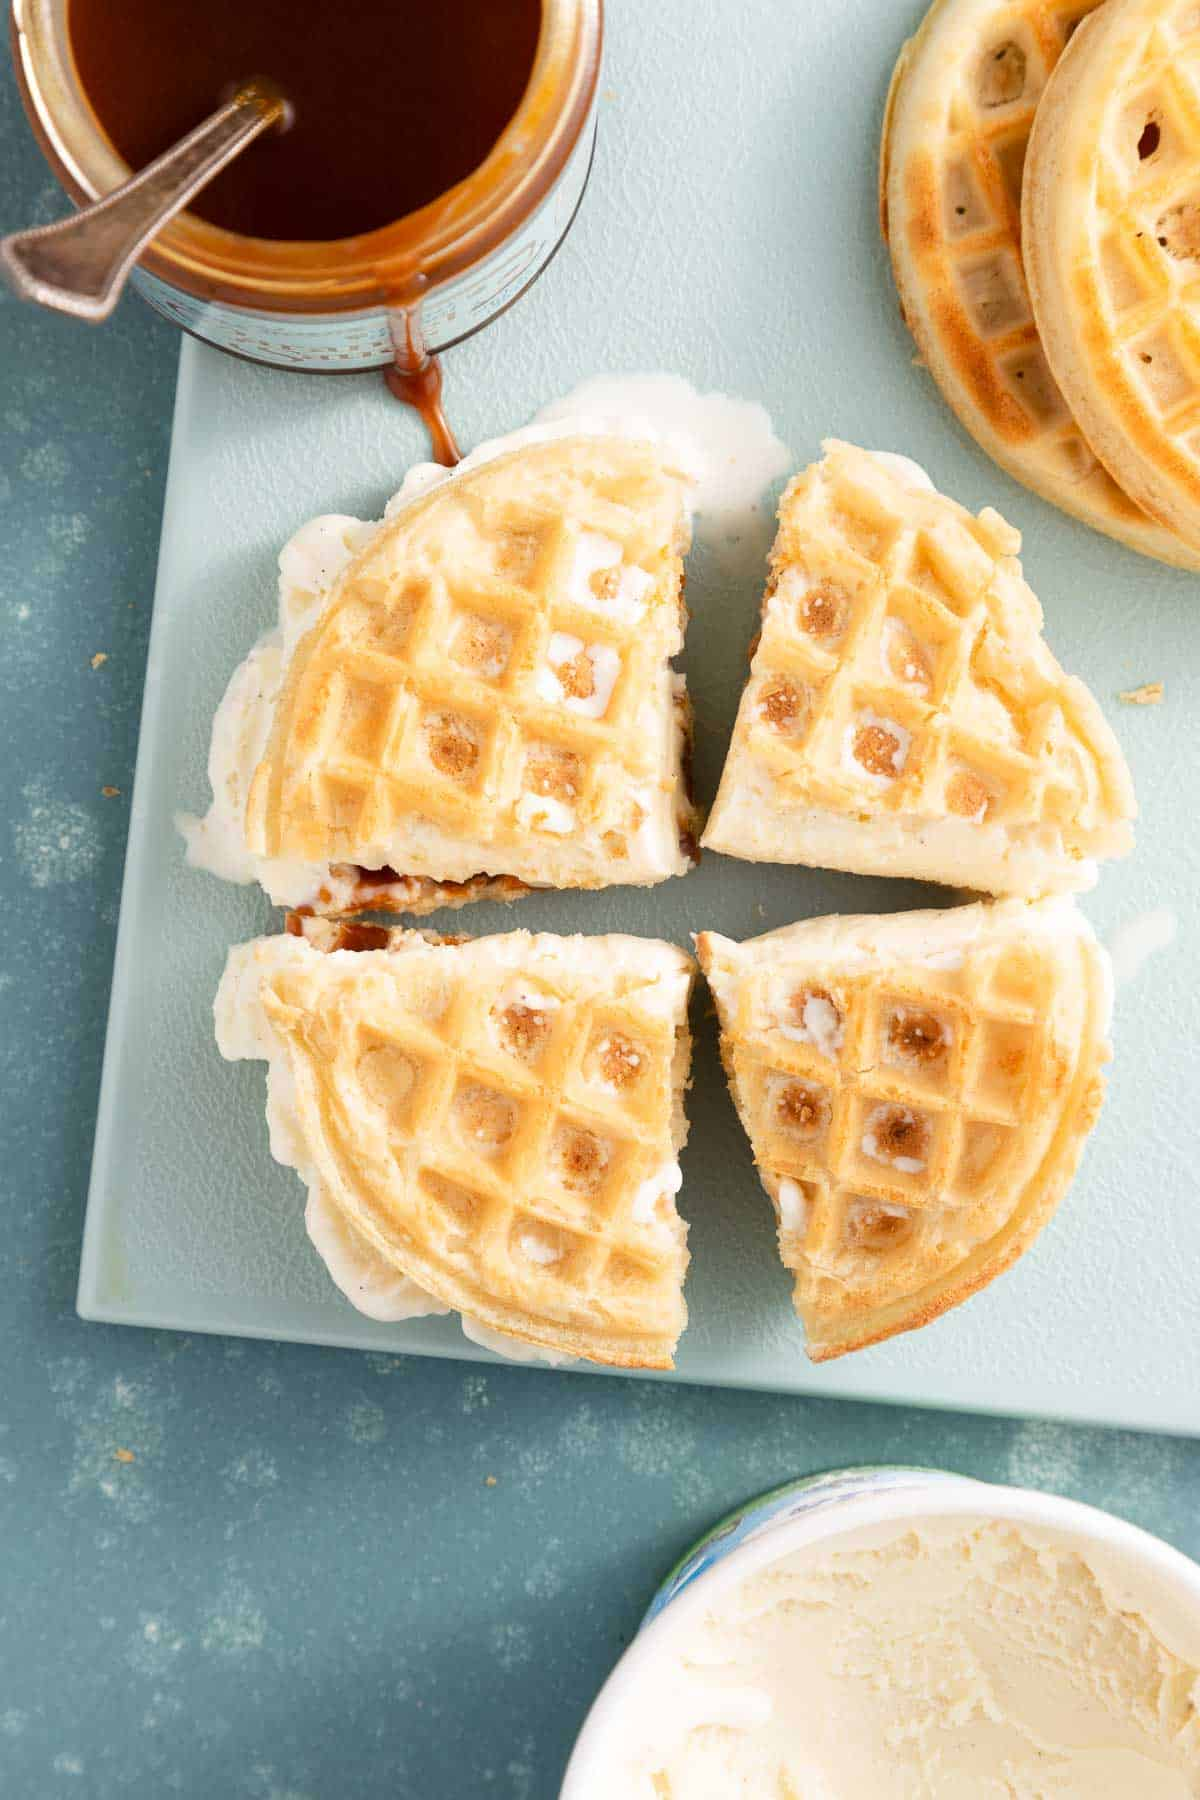 waffle ice cream sandwich cut into 4 pieces